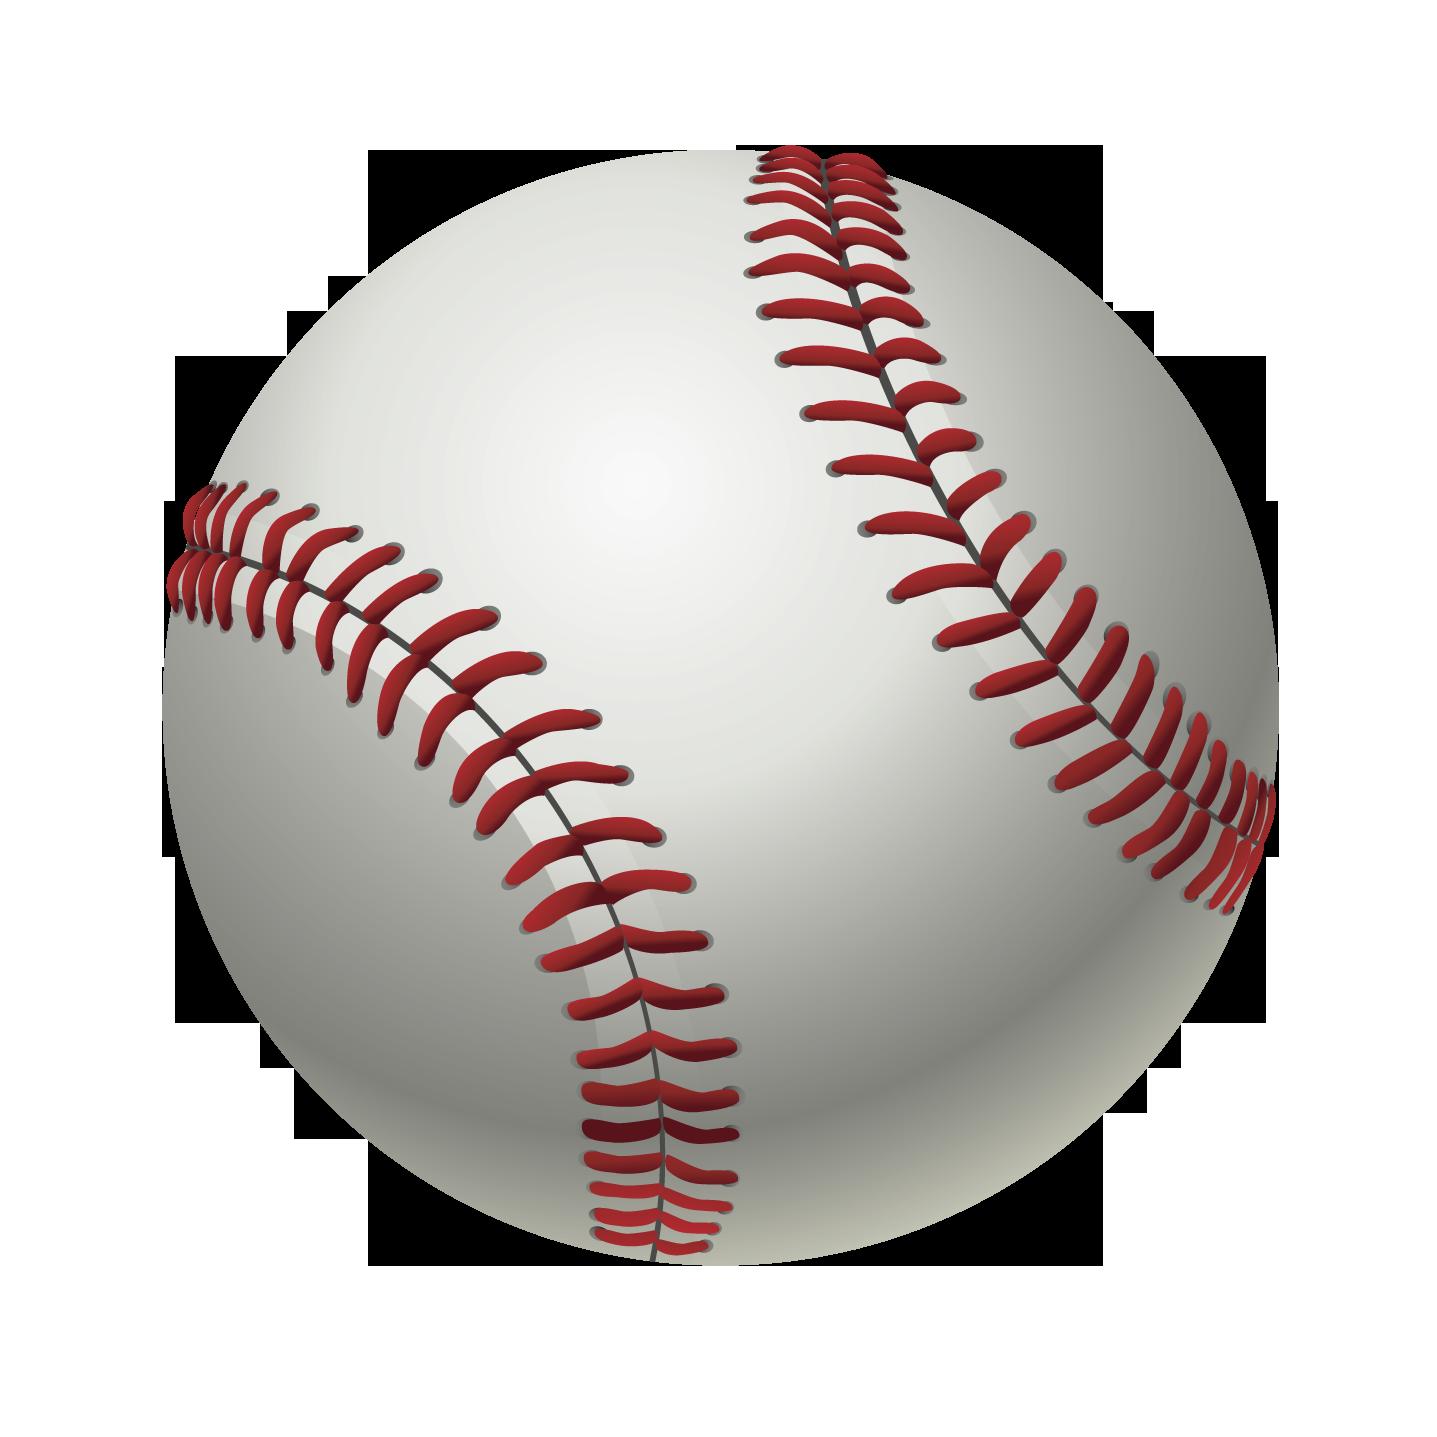 Free transparent baseball clipart jpg download Baseball Icon Clipart | Web Icons PNG jpg download